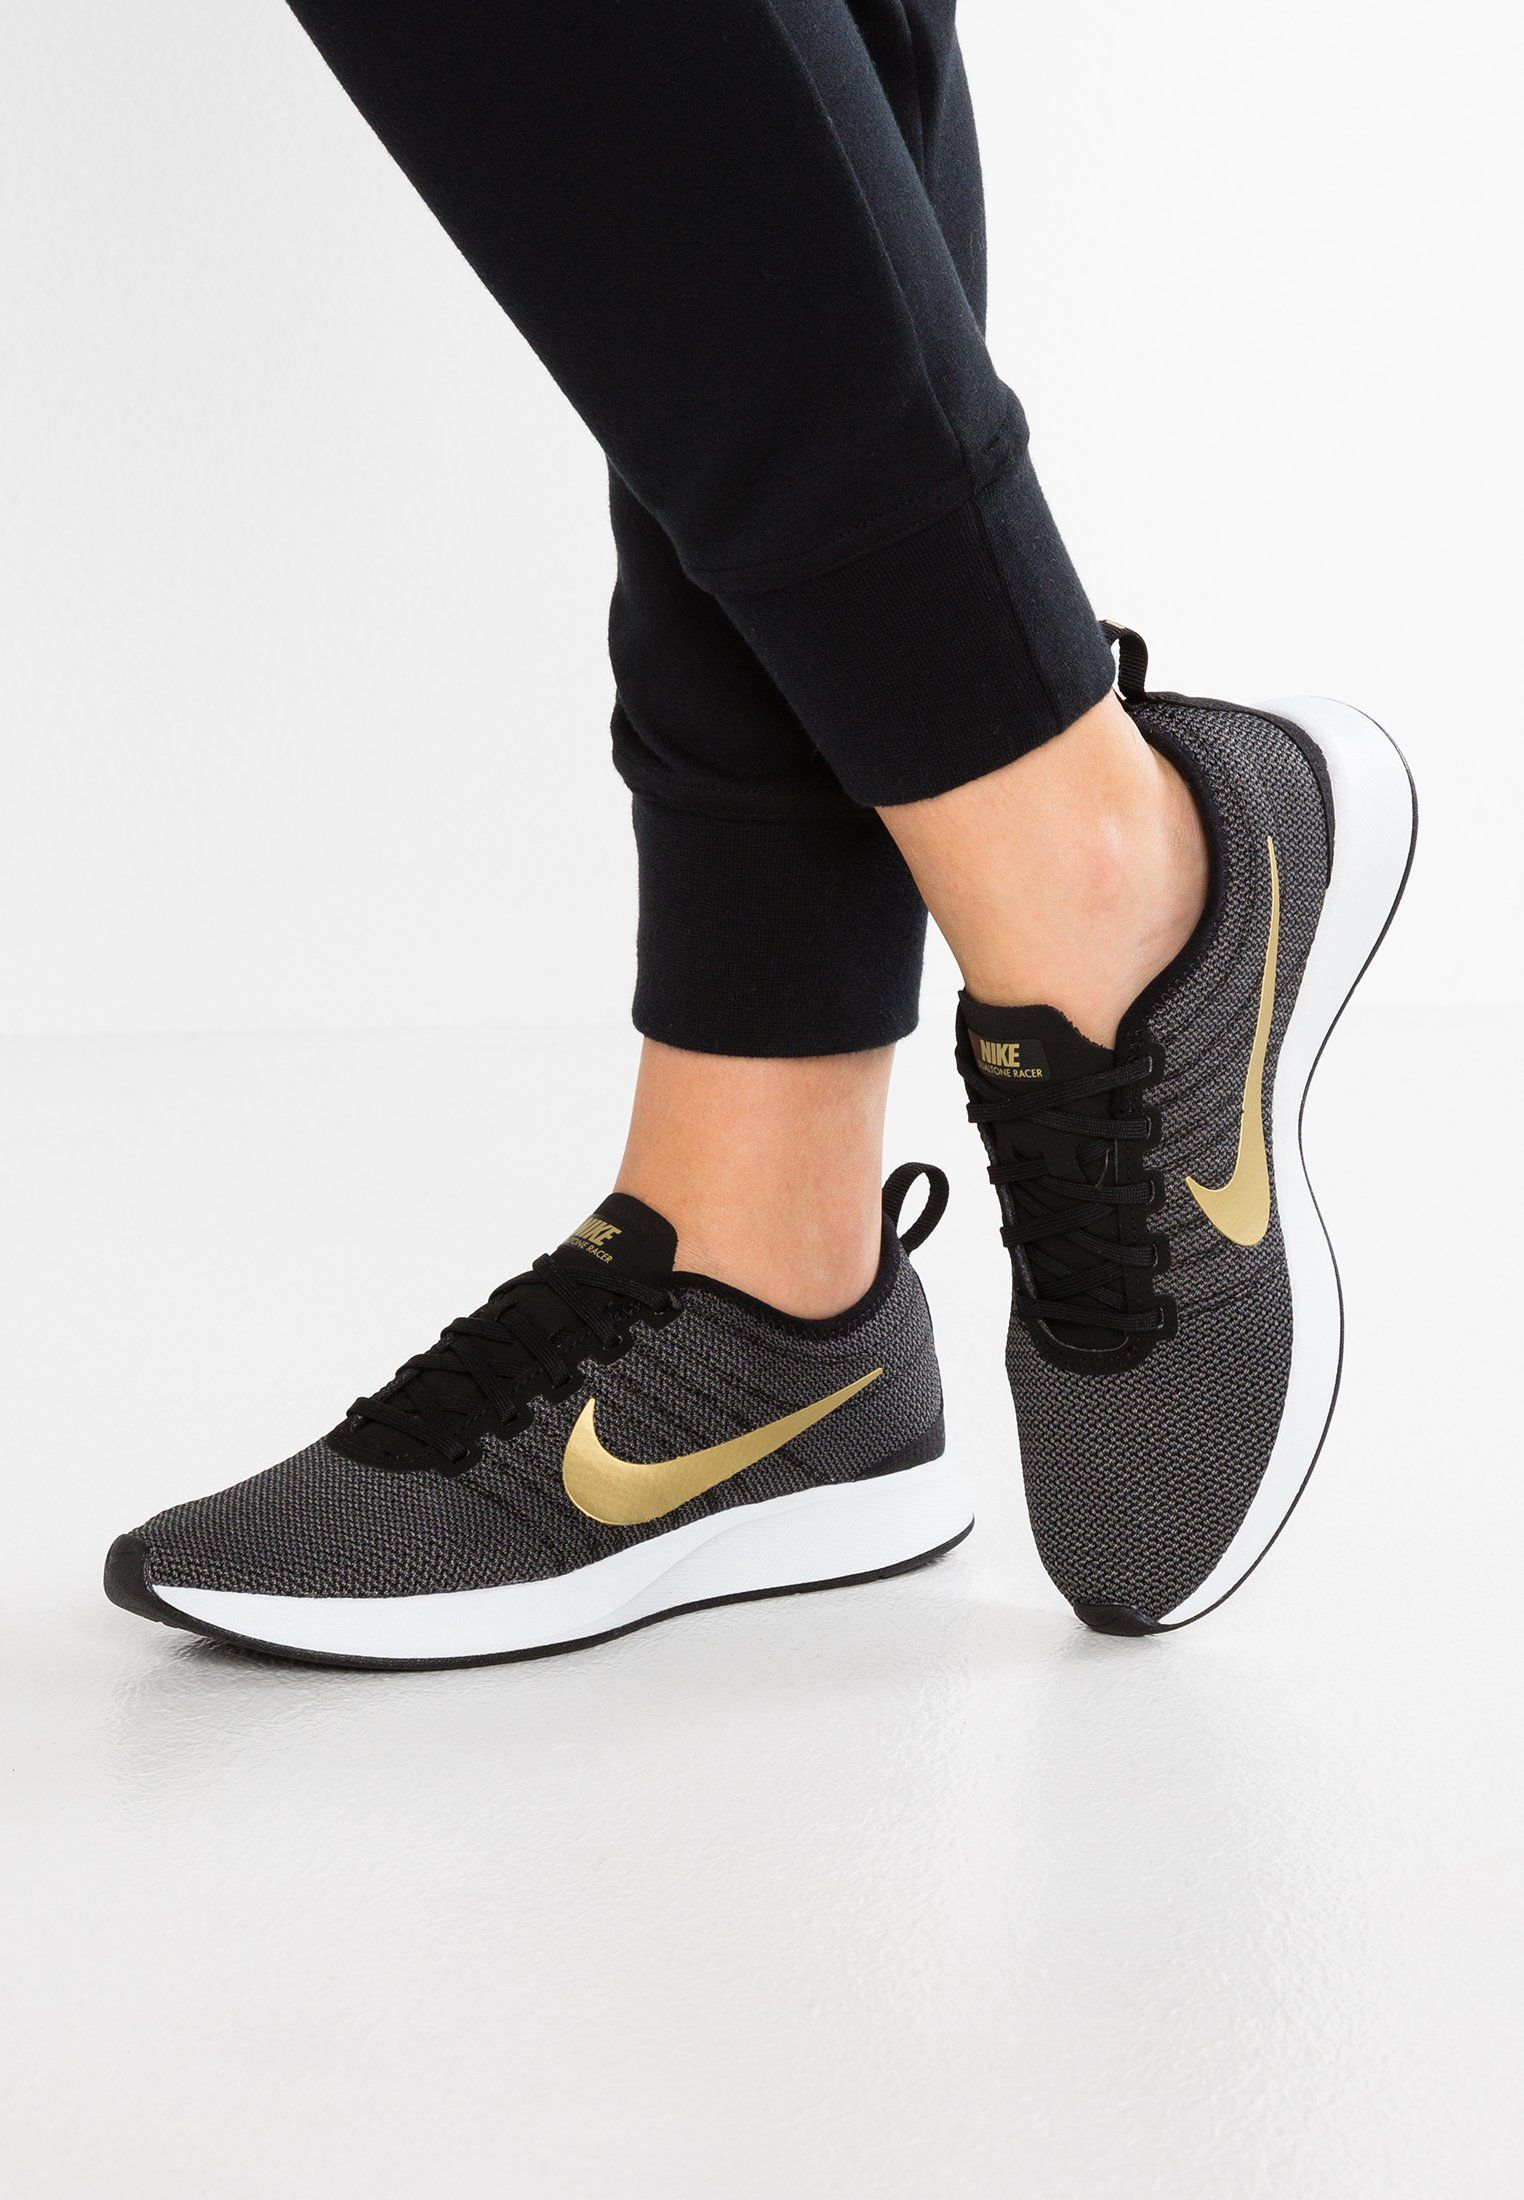 Nike Sportswear DUALTONE RACER SE - Trainers - black/metallic gold/dark grey/white ZCjwr5H